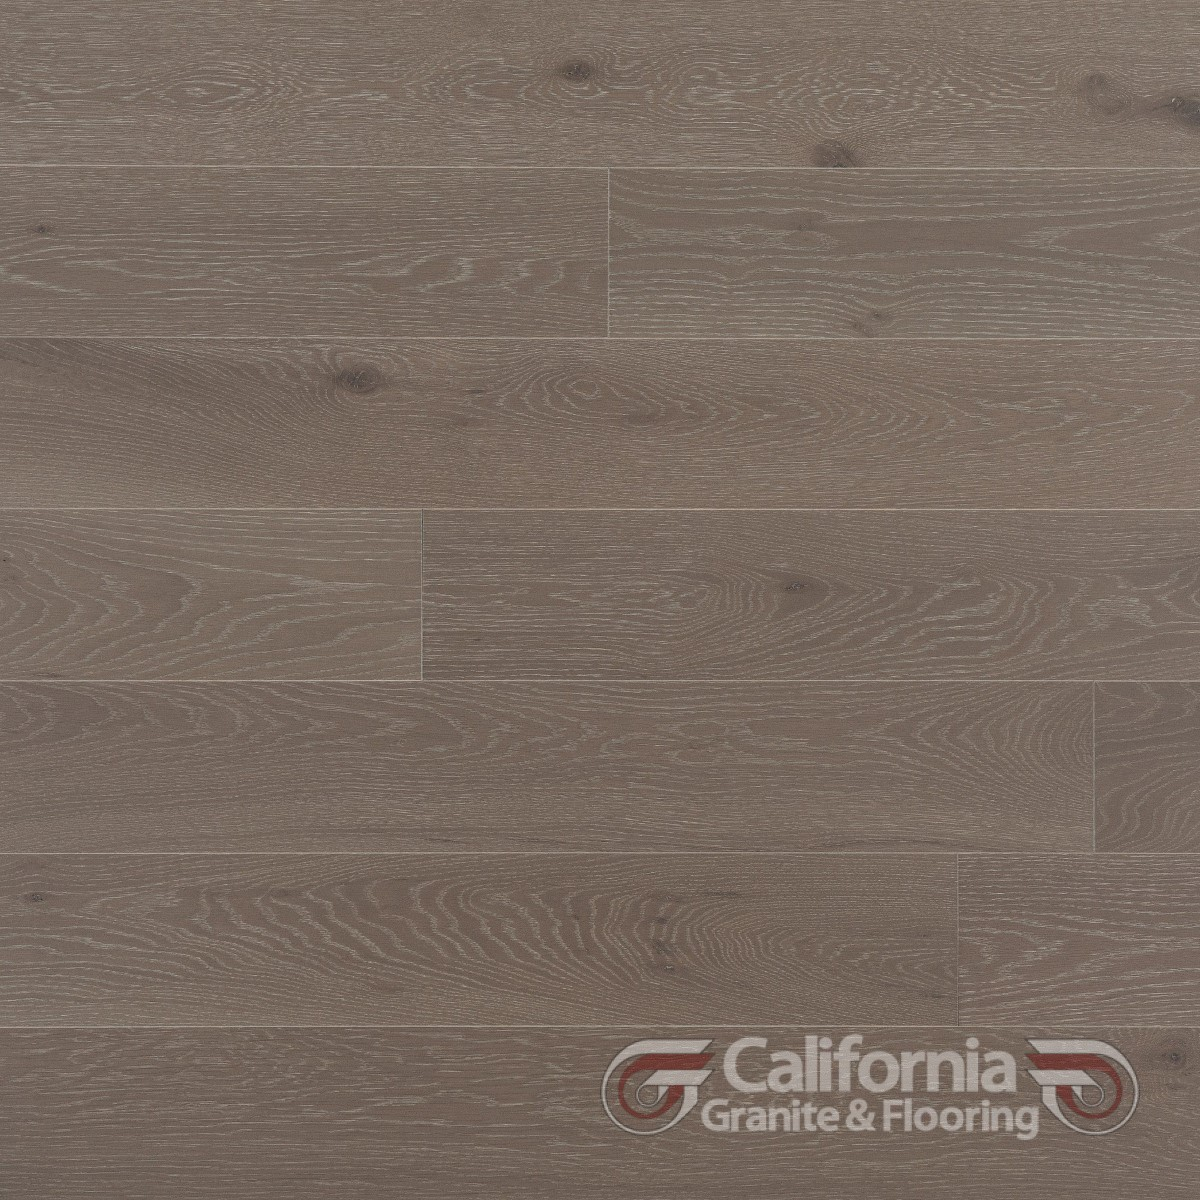 hardwood-flooring-white-oak-roller-coaster-character-brushed-2